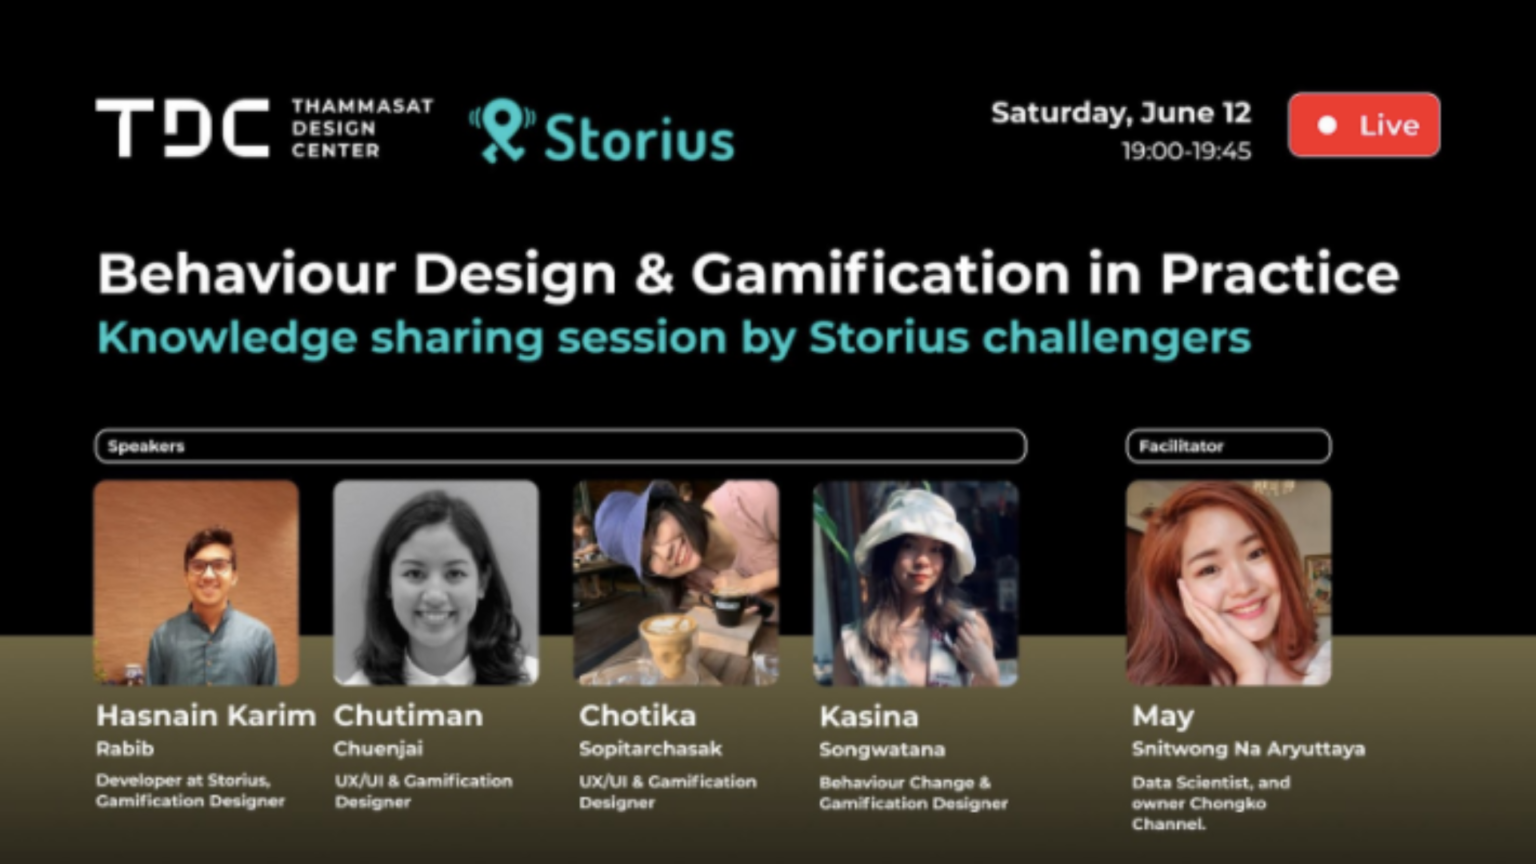 Behaviour Design & Gamification in Practice Live Talk